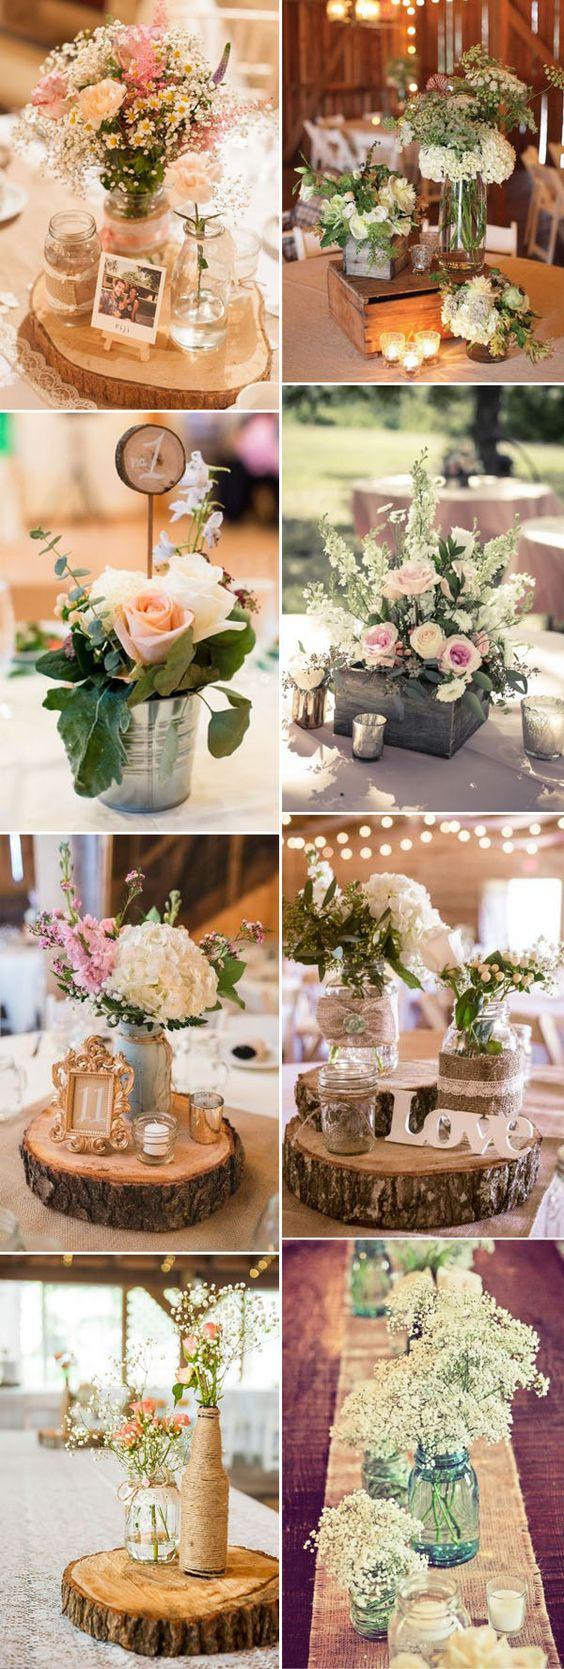 creative rustic wedding centerpieces ideas: